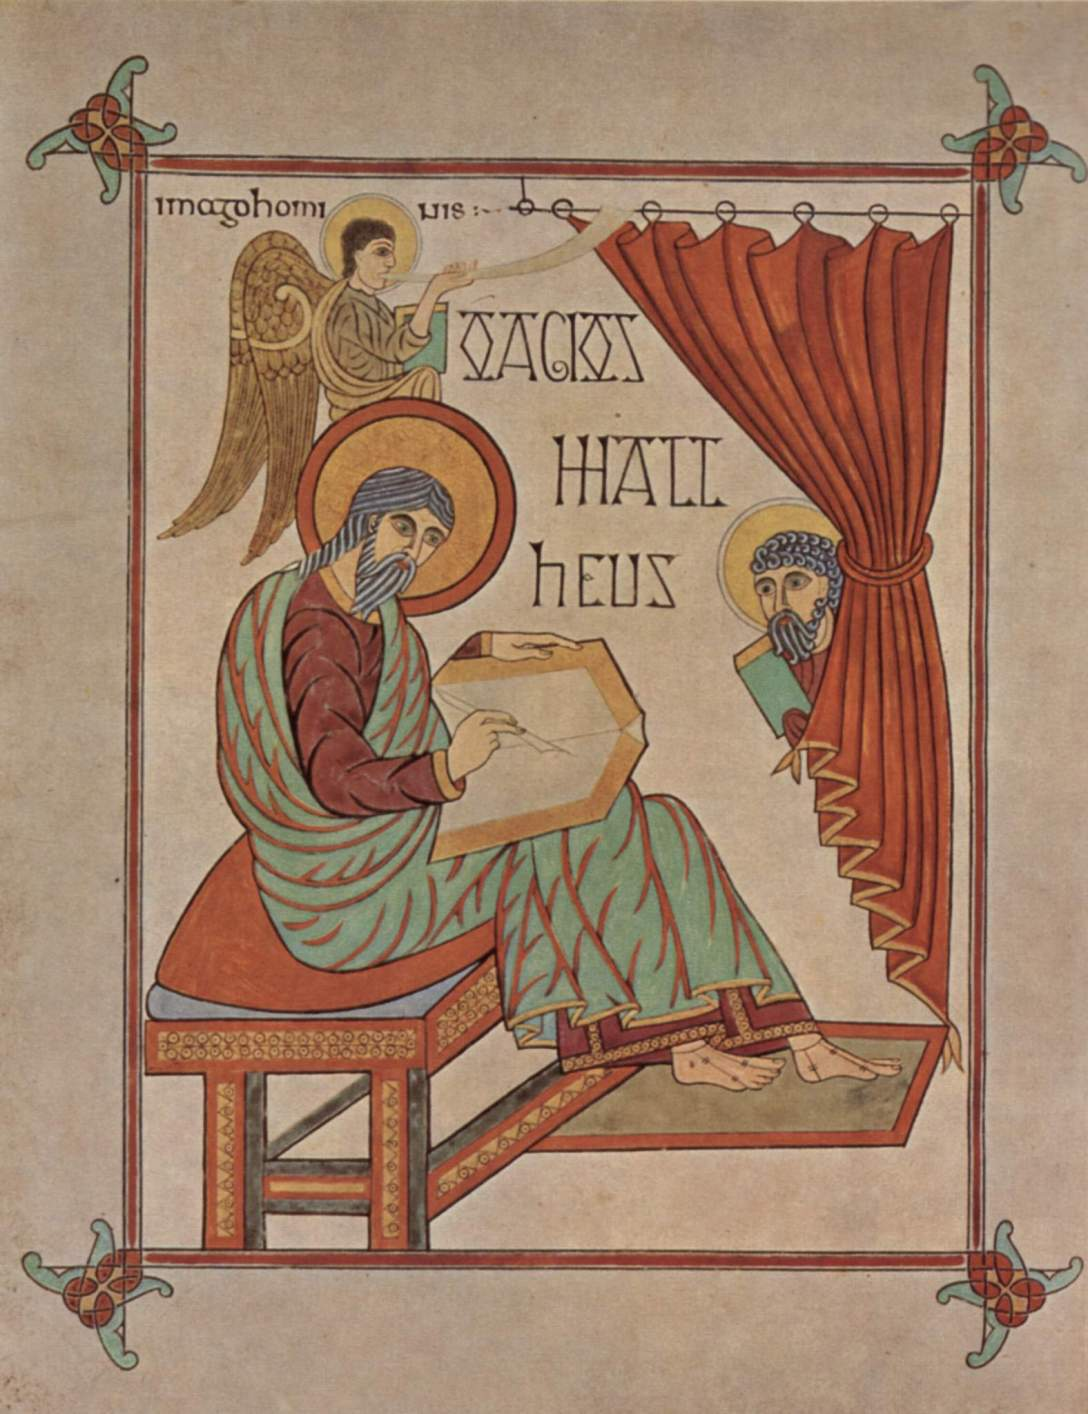 Matthew Writing His Gospel - Lindisfarne Gospel Book (c. 715-720)